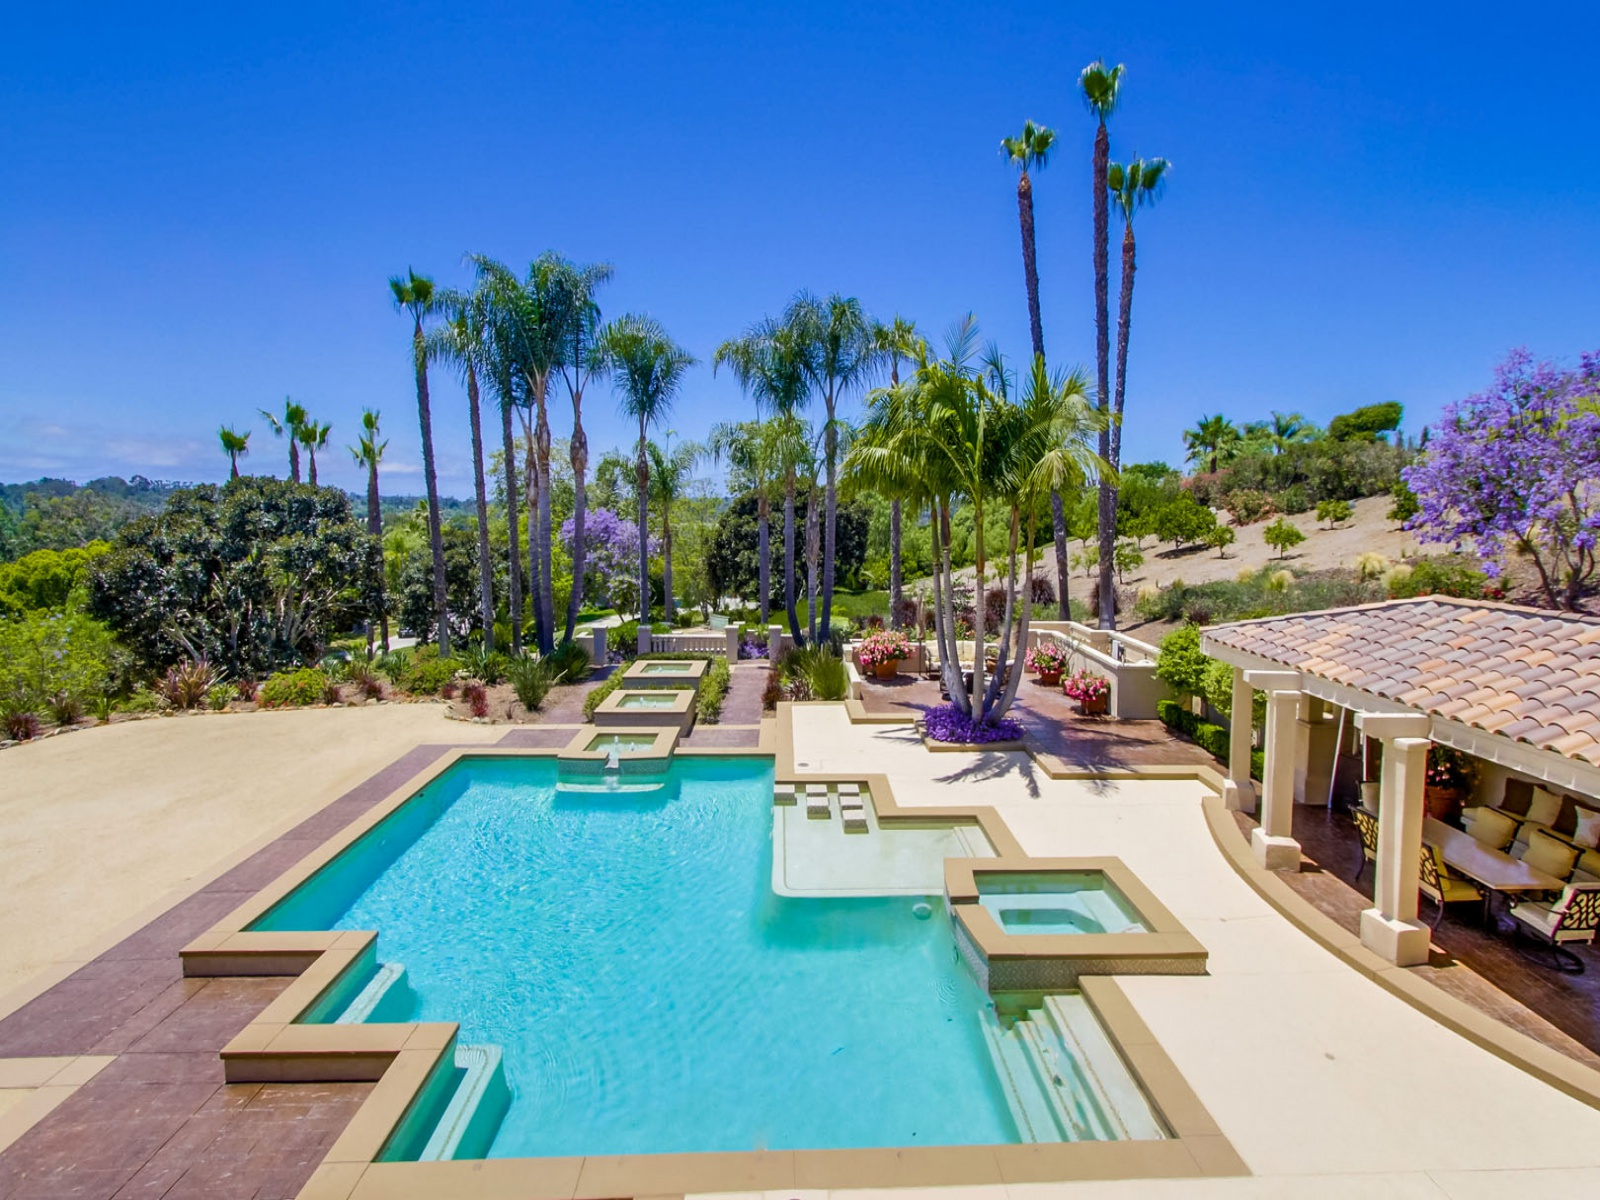 7354 Vista Rancho Ct.,Rancho Santa Fe,California 92067,House,Vista Rancho Ct.,1013